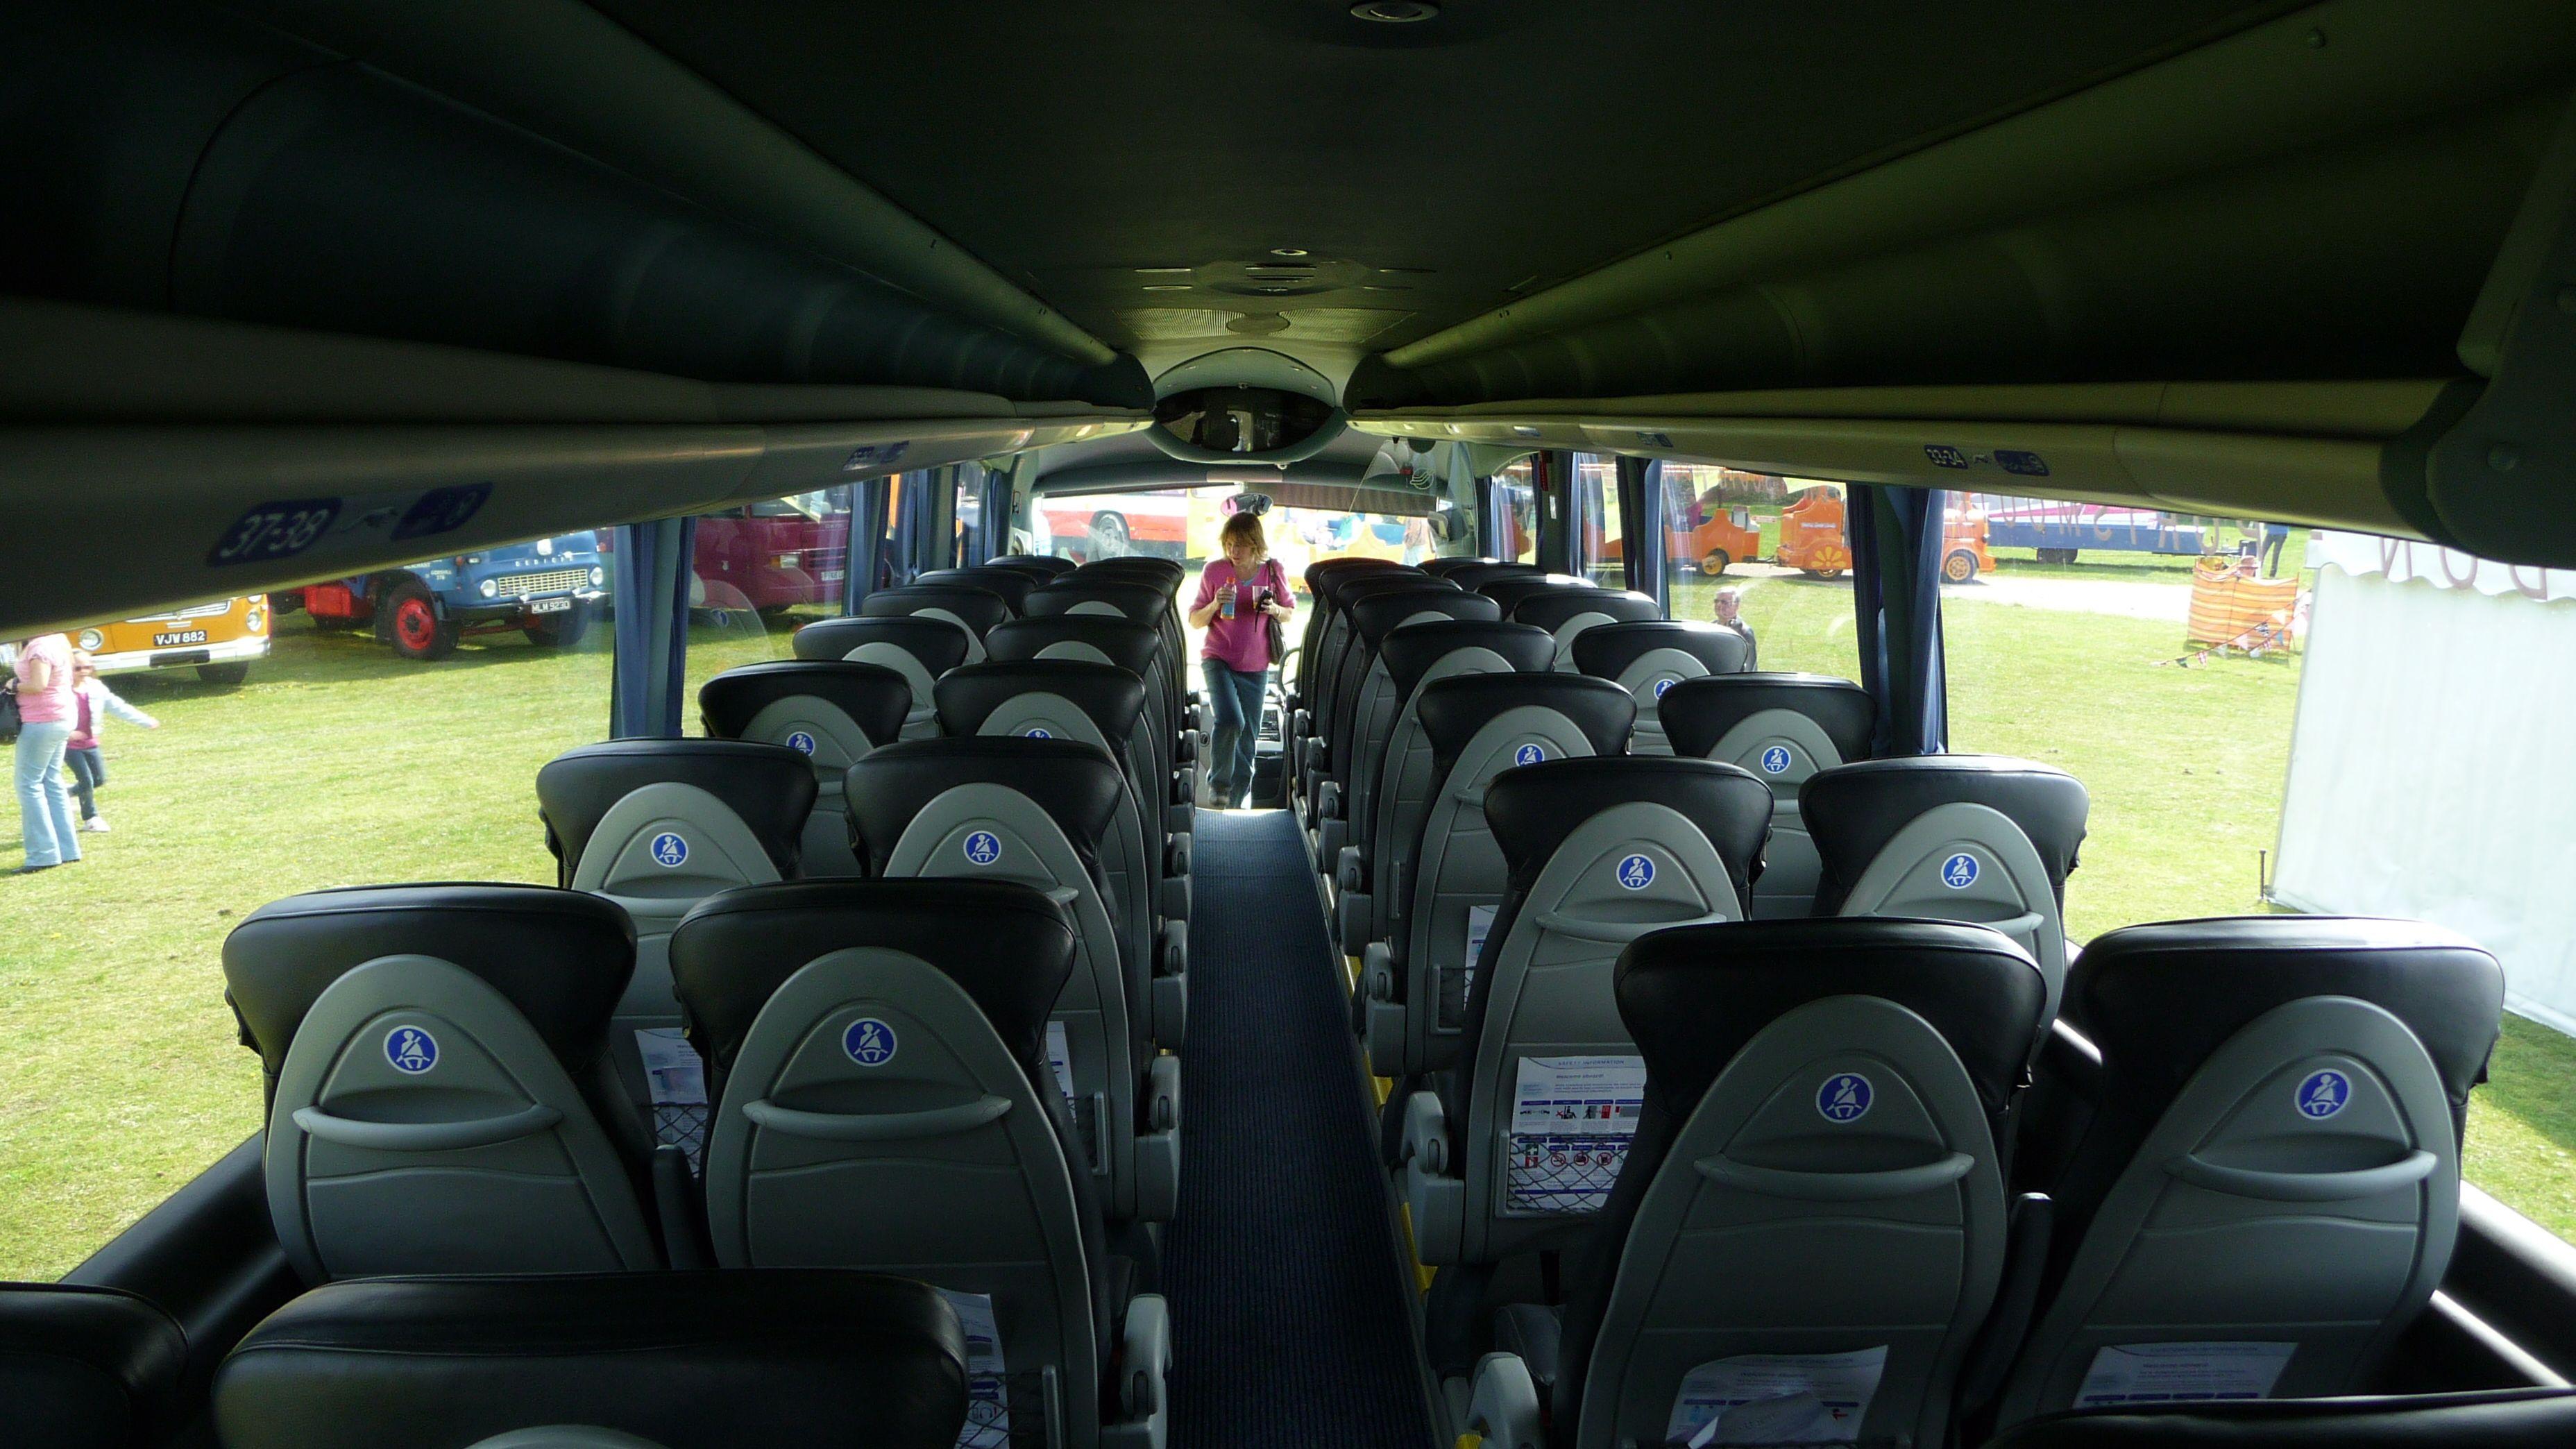 Greyhound Bus Interior File Greyhound Uk 23315 Yn55 Pxf Interior